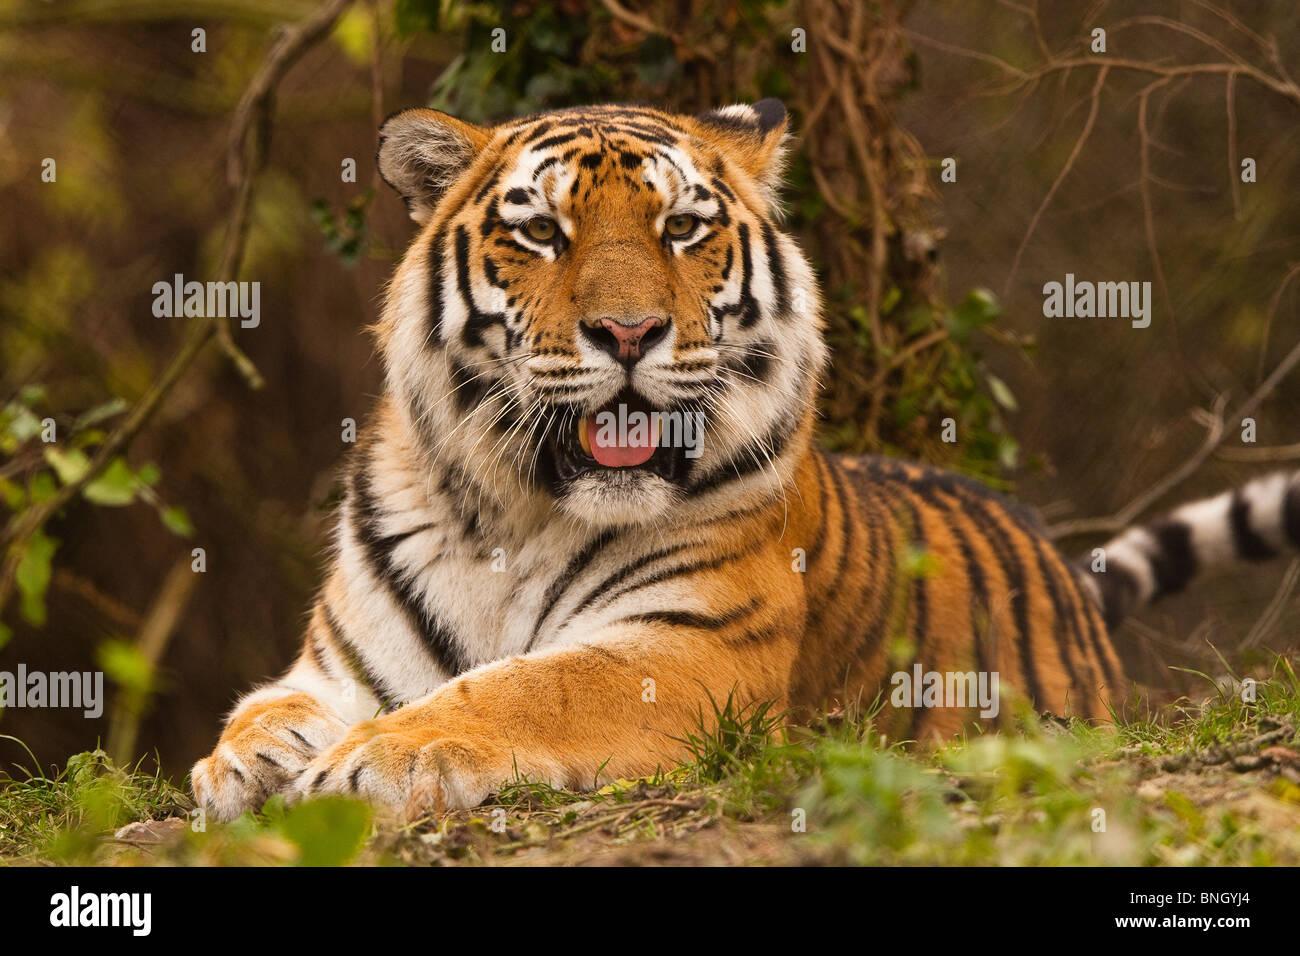 Siberian/tigre di Amur Immagini Stock